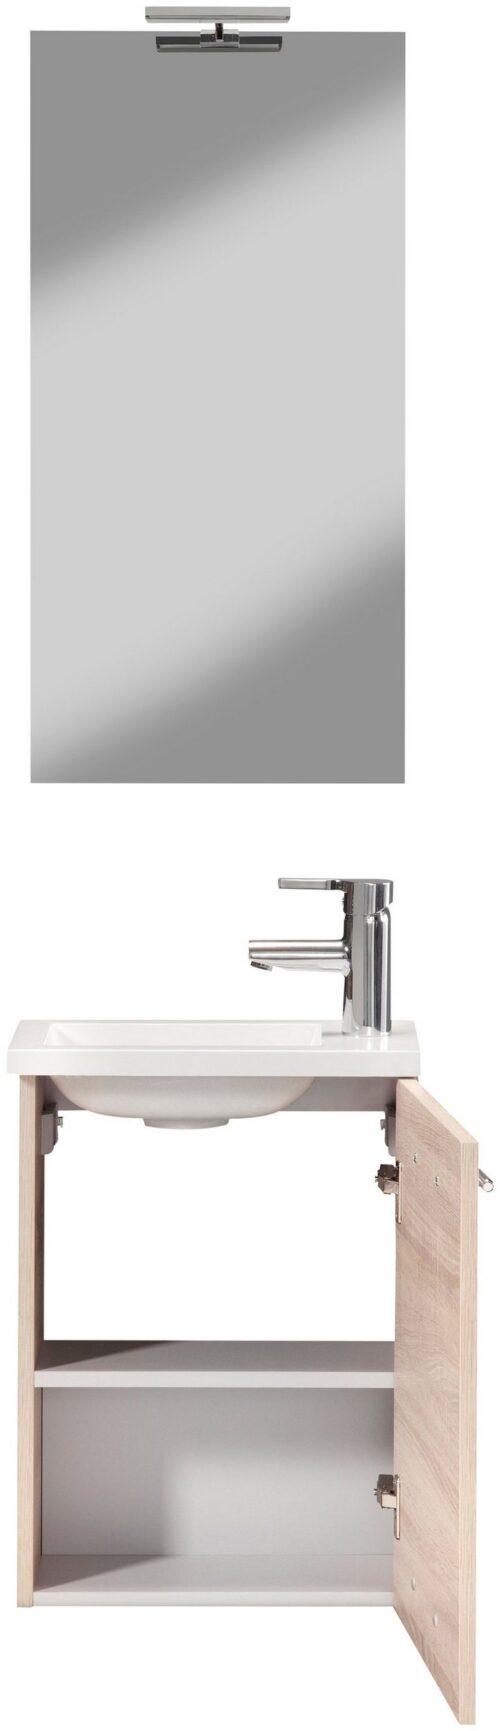 CYGNUS BATH Badmöbel-Set MICRO Gästebad B 40cm B79163916 UVP 399,99€ | 79163916 2